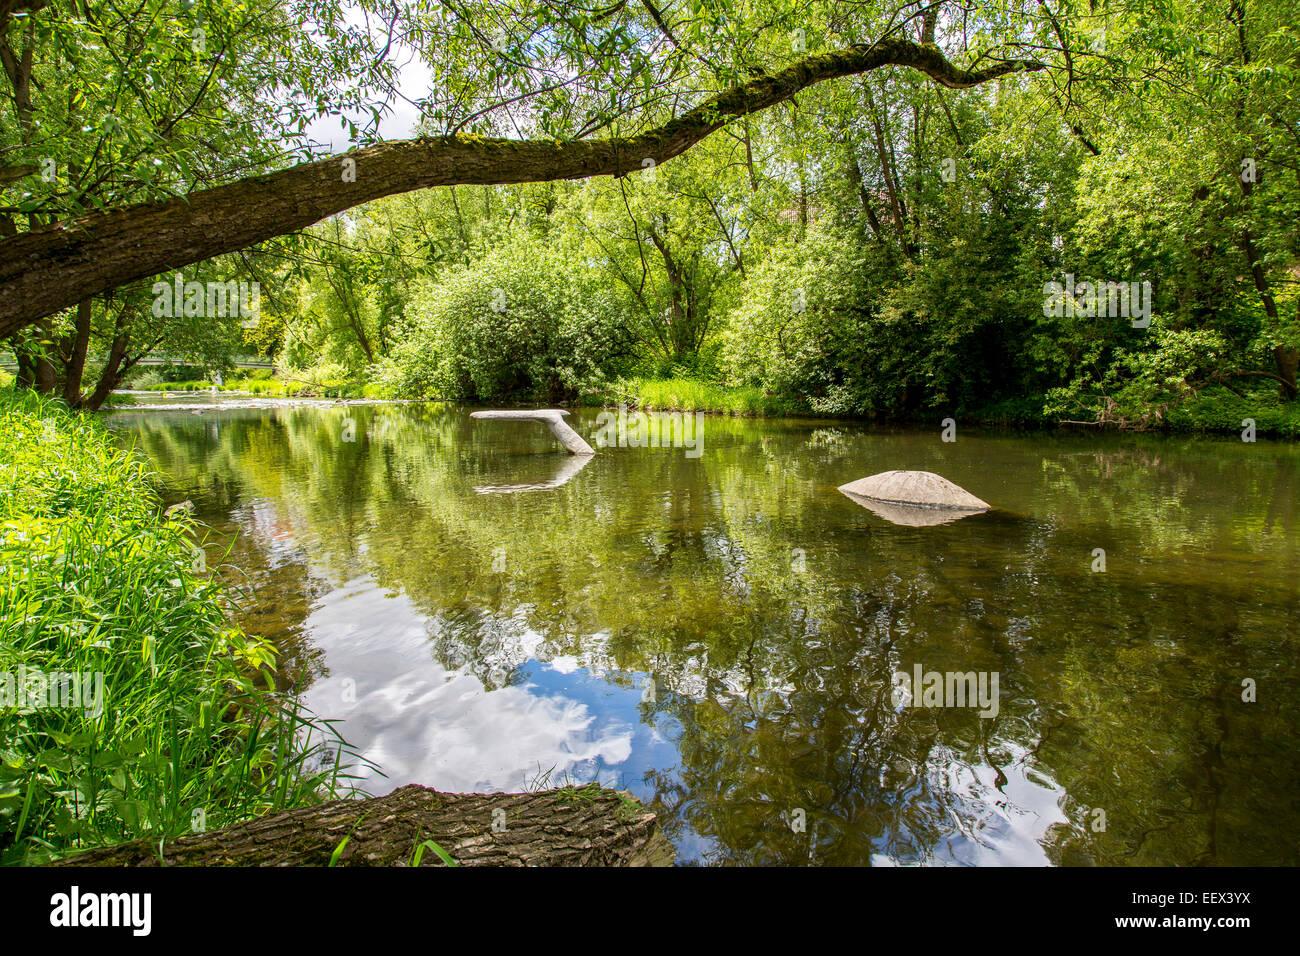 "River Ruhr in Arnsberg, Sauerland region,  Artwork ""Ruhr Whale"" sculpture in the river Stock Photo"